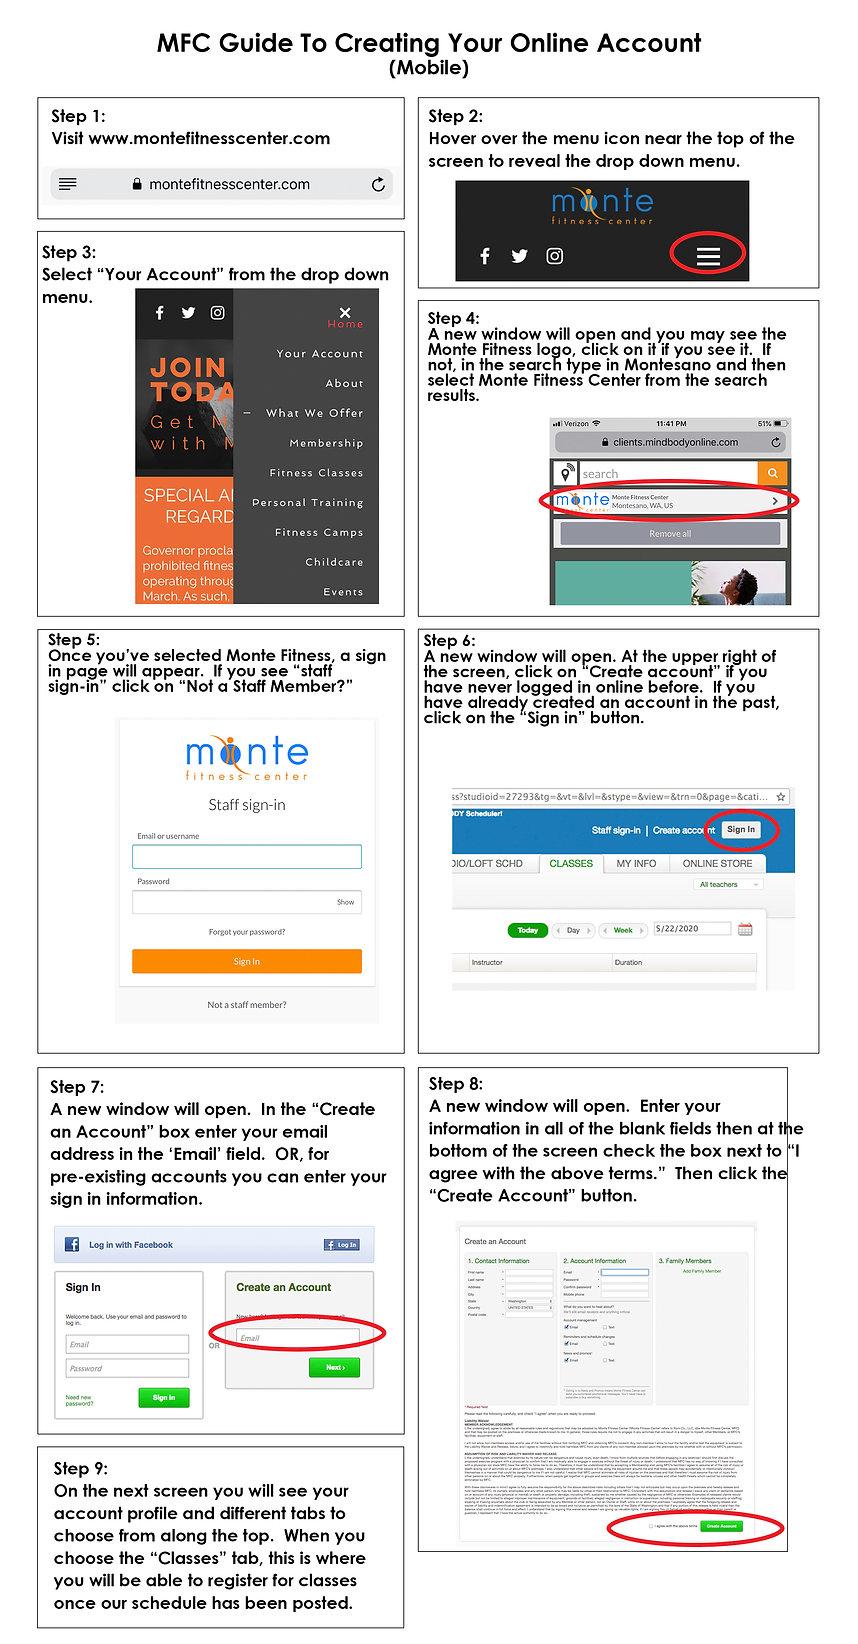 mobile account guide 1_6_21.jpg